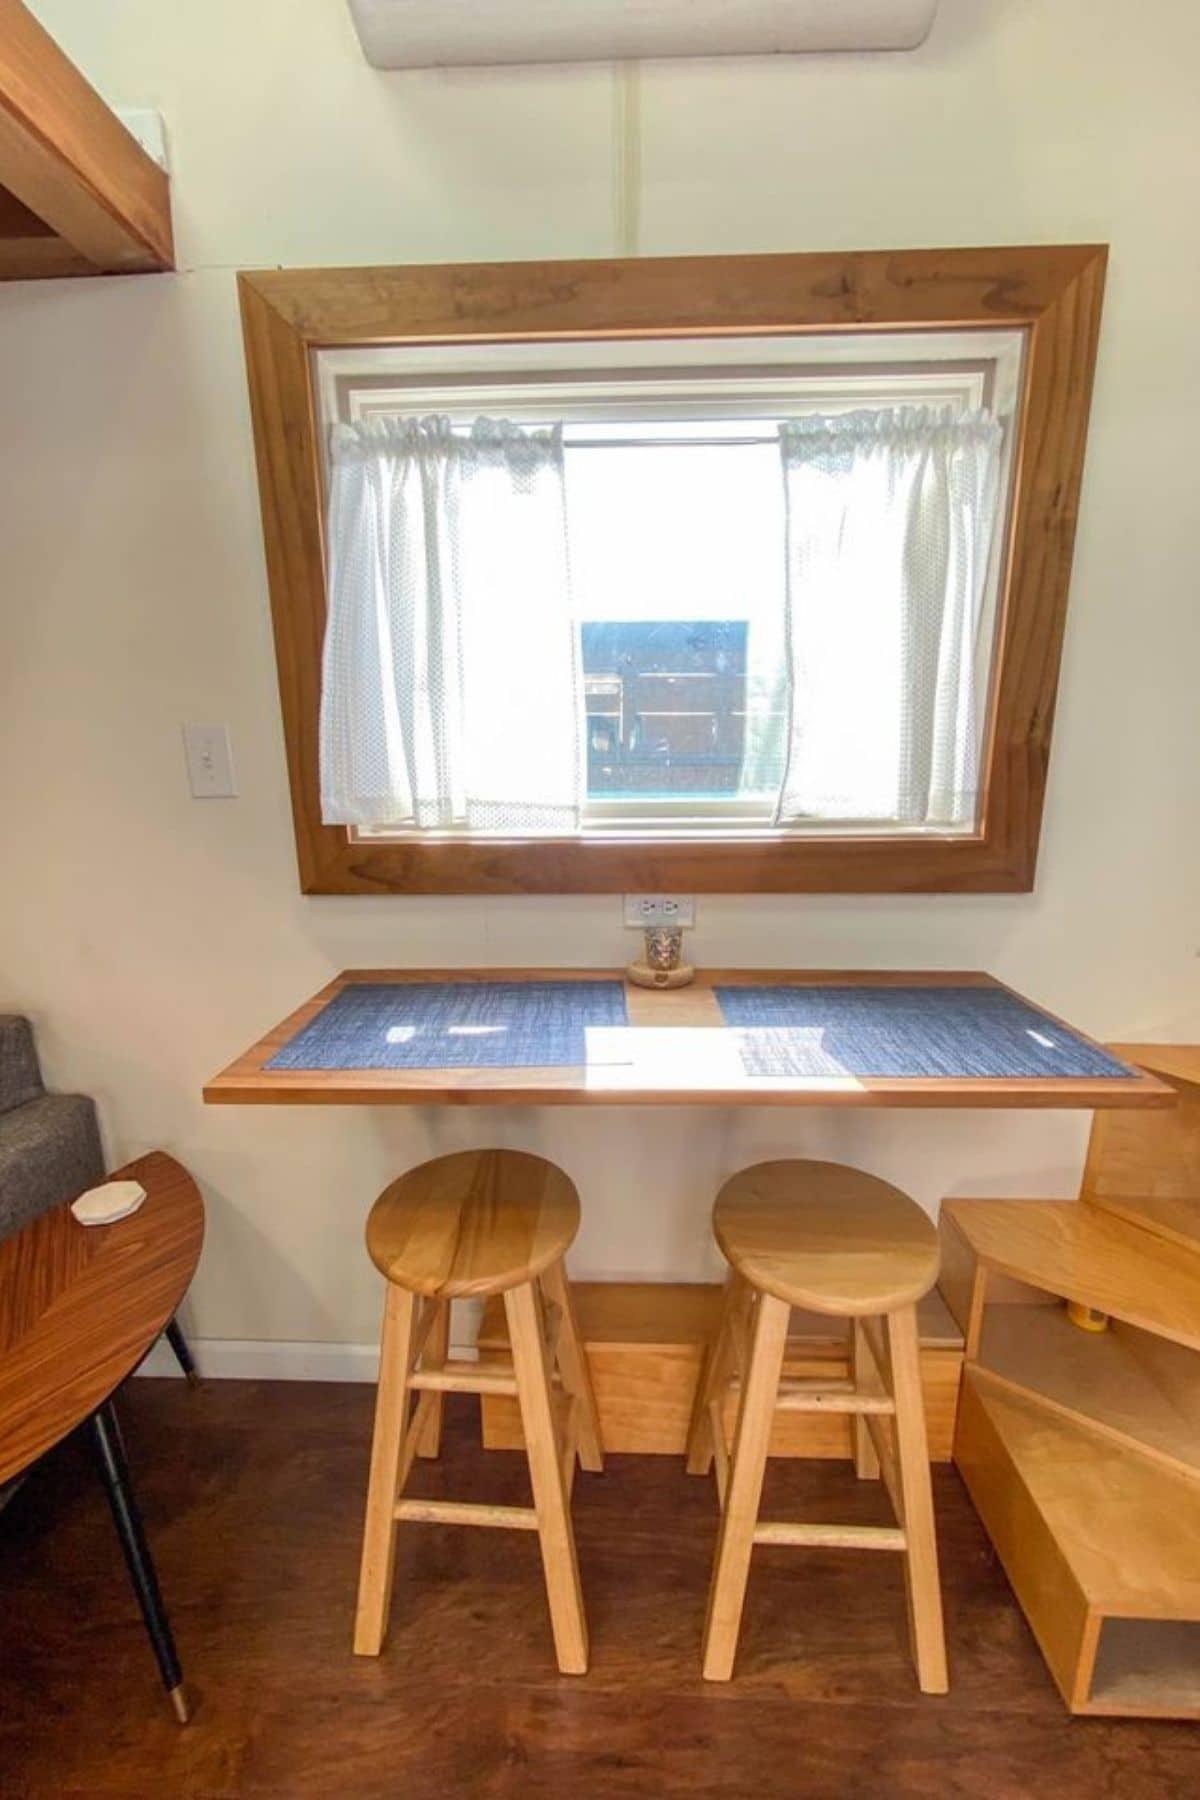 Blue and wood shelf under large window with light wood stools